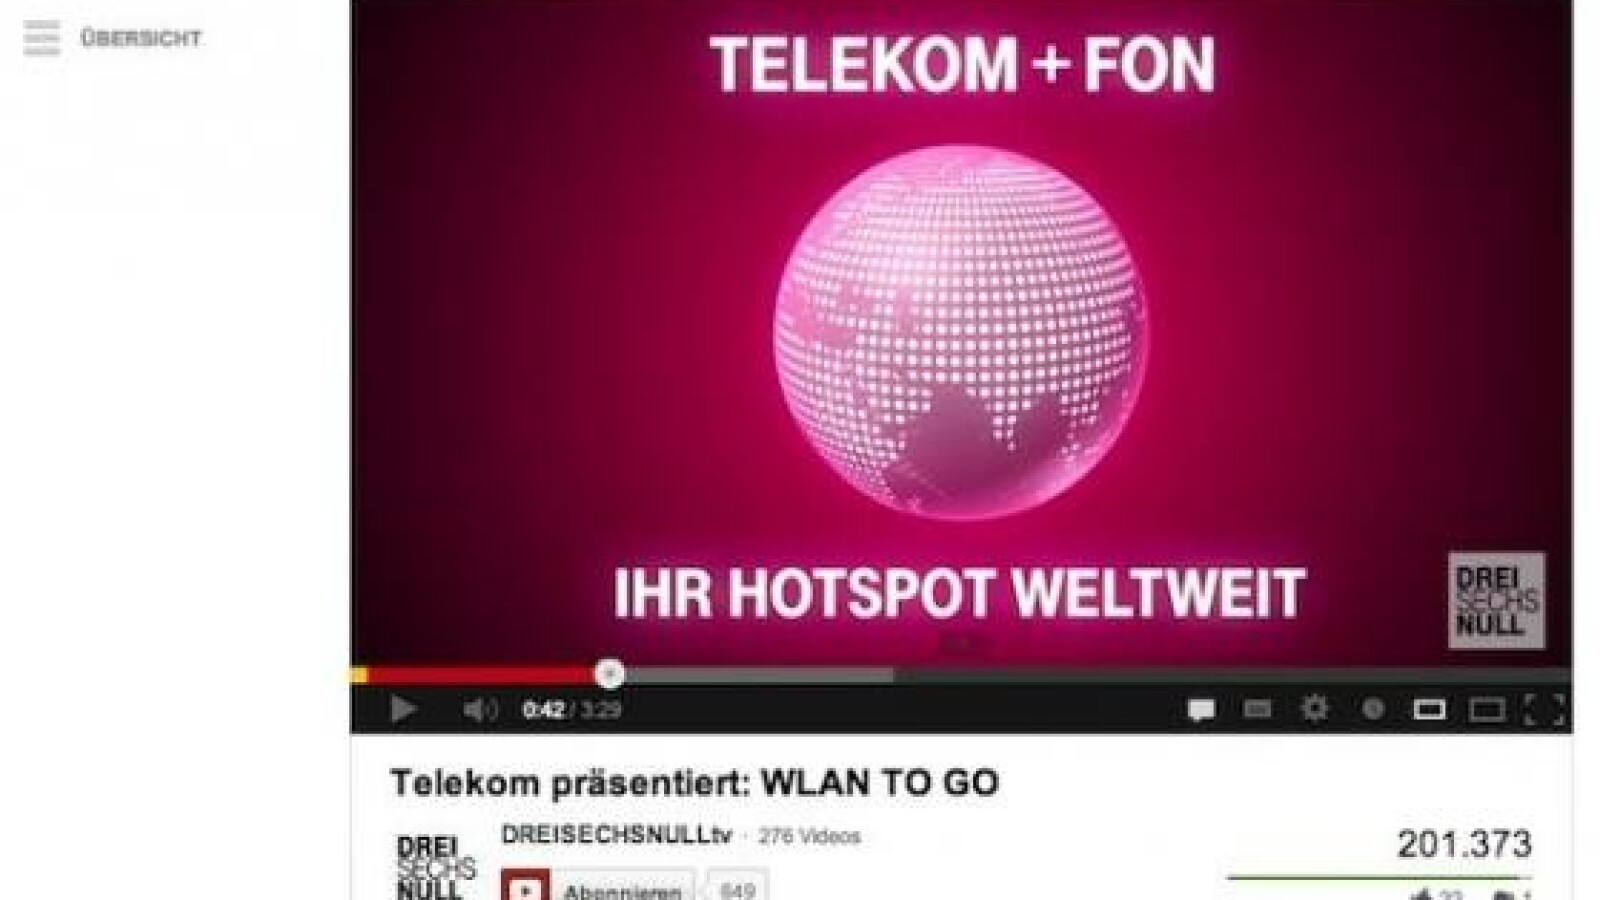 wlan to go telekom bringt hotspot router speedport w 724v netzwelt. Black Bedroom Furniture Sets. Home Design Ideas